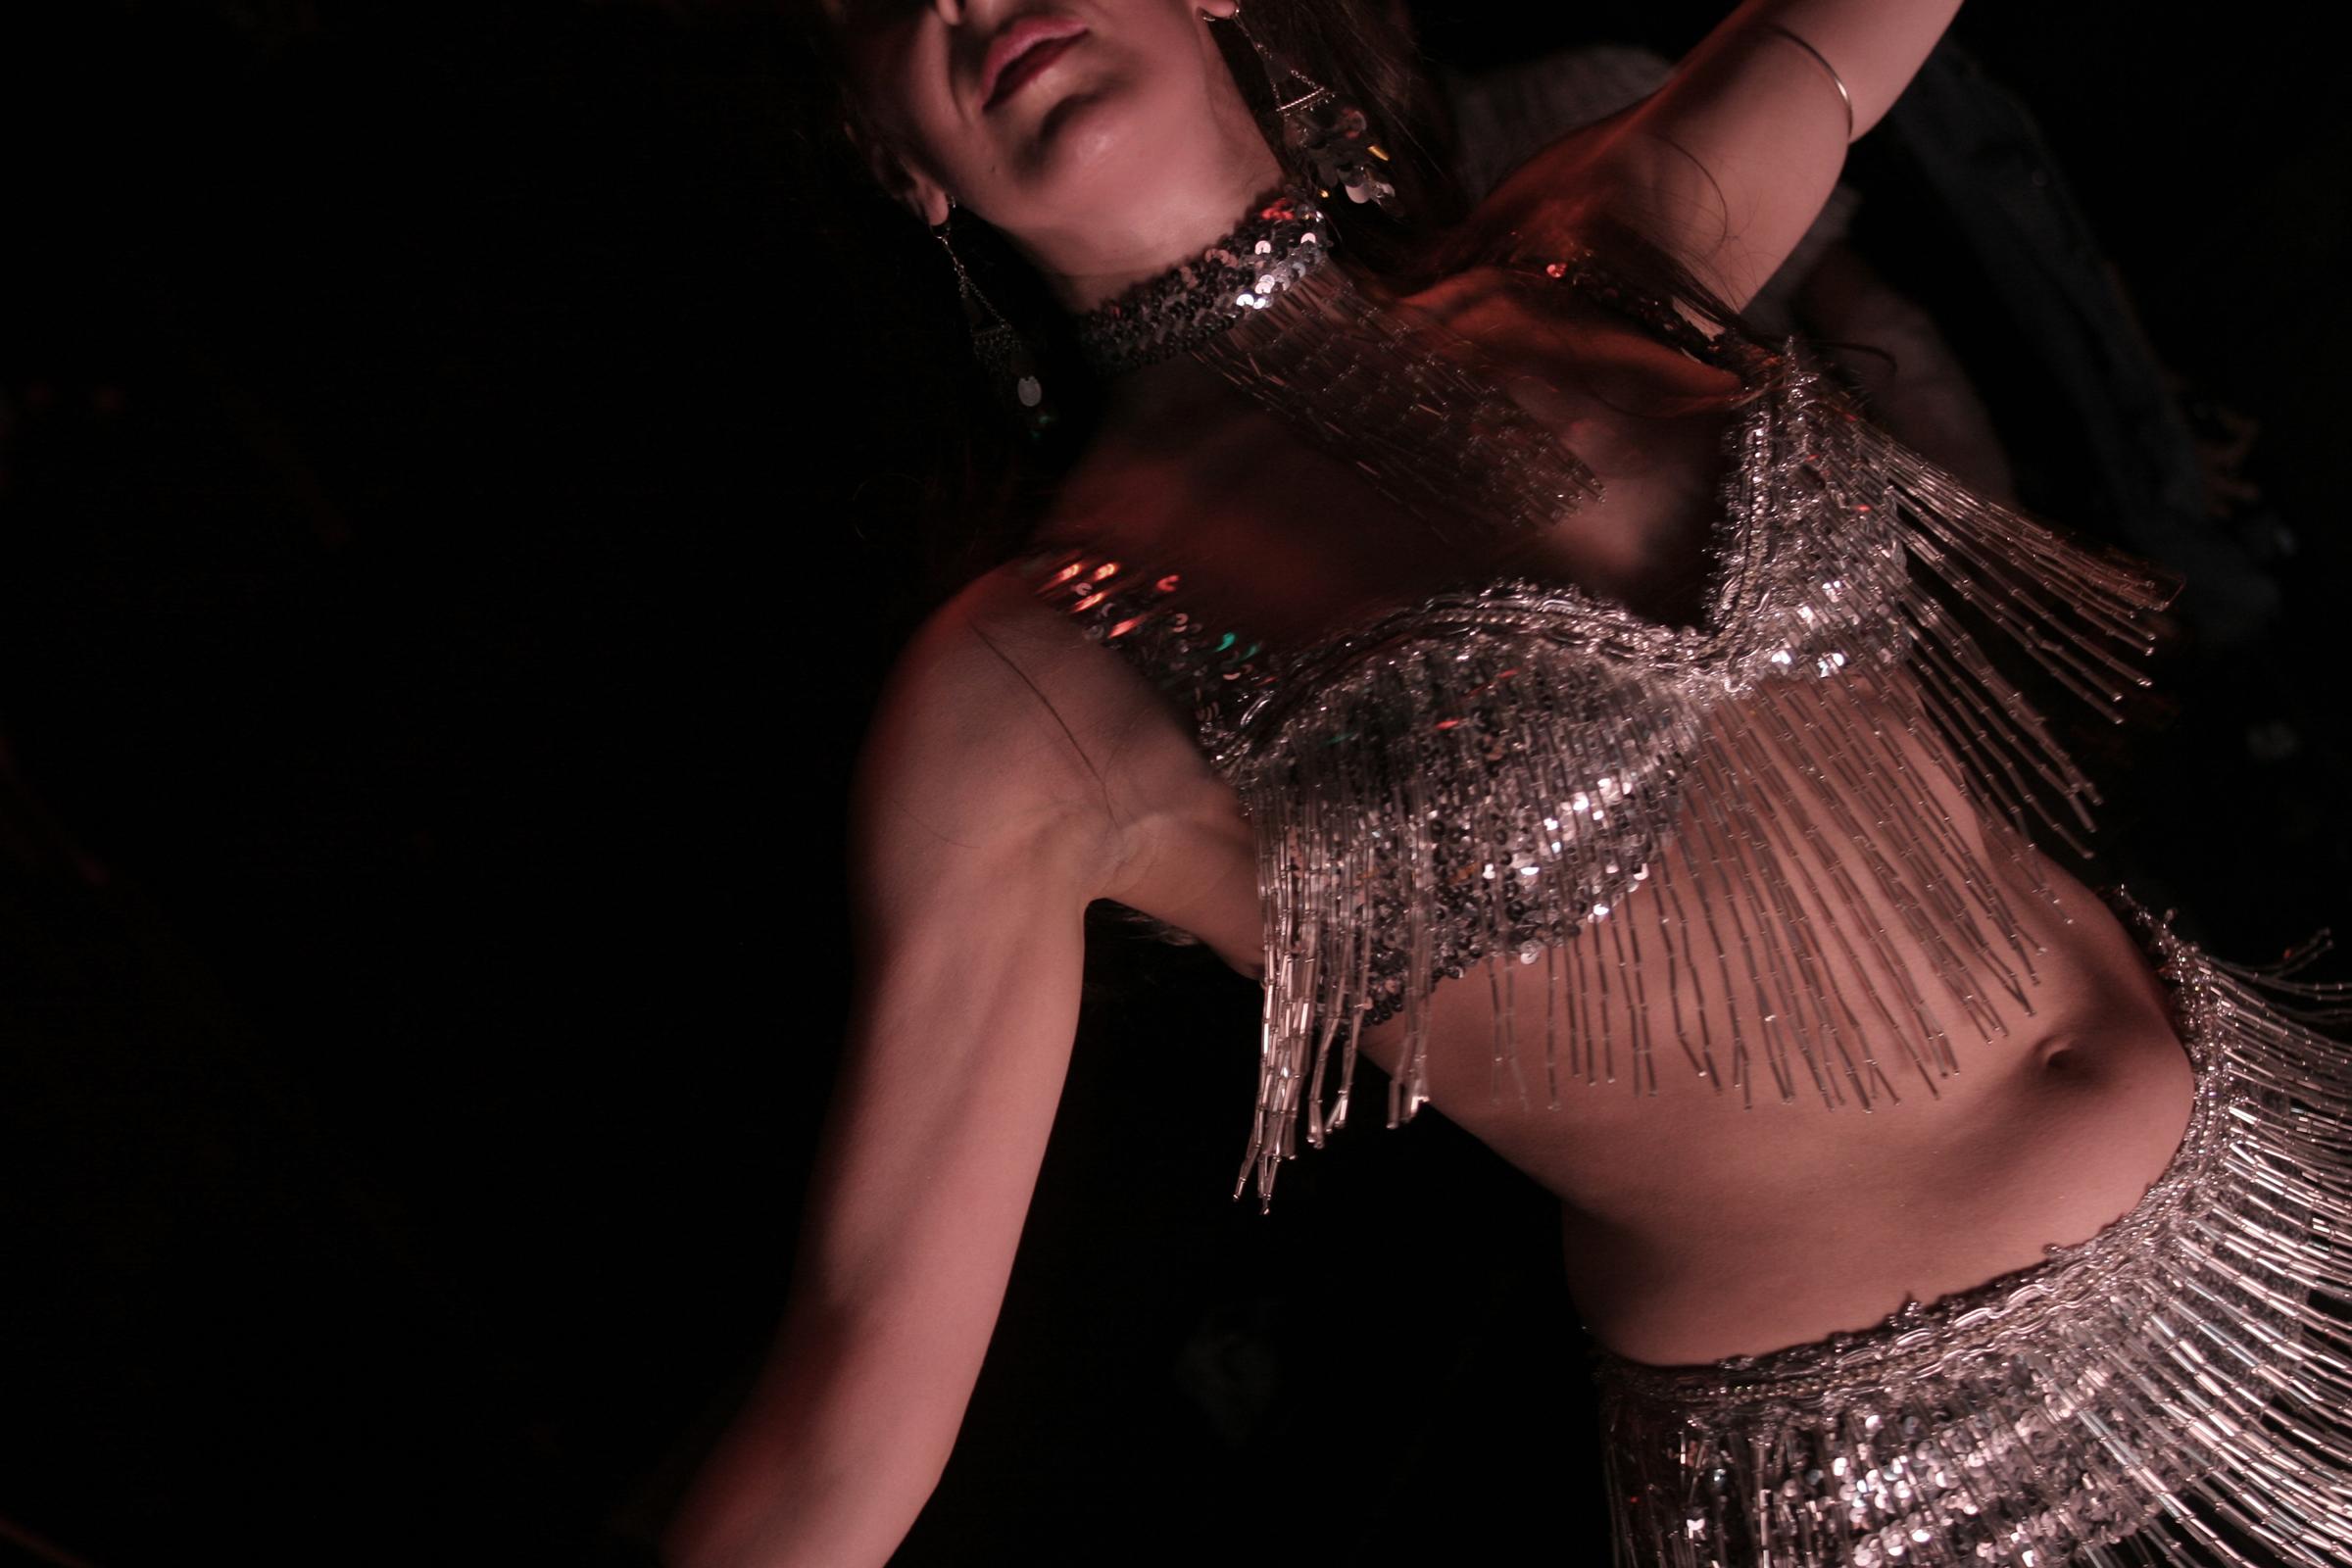 dancer_grygiel